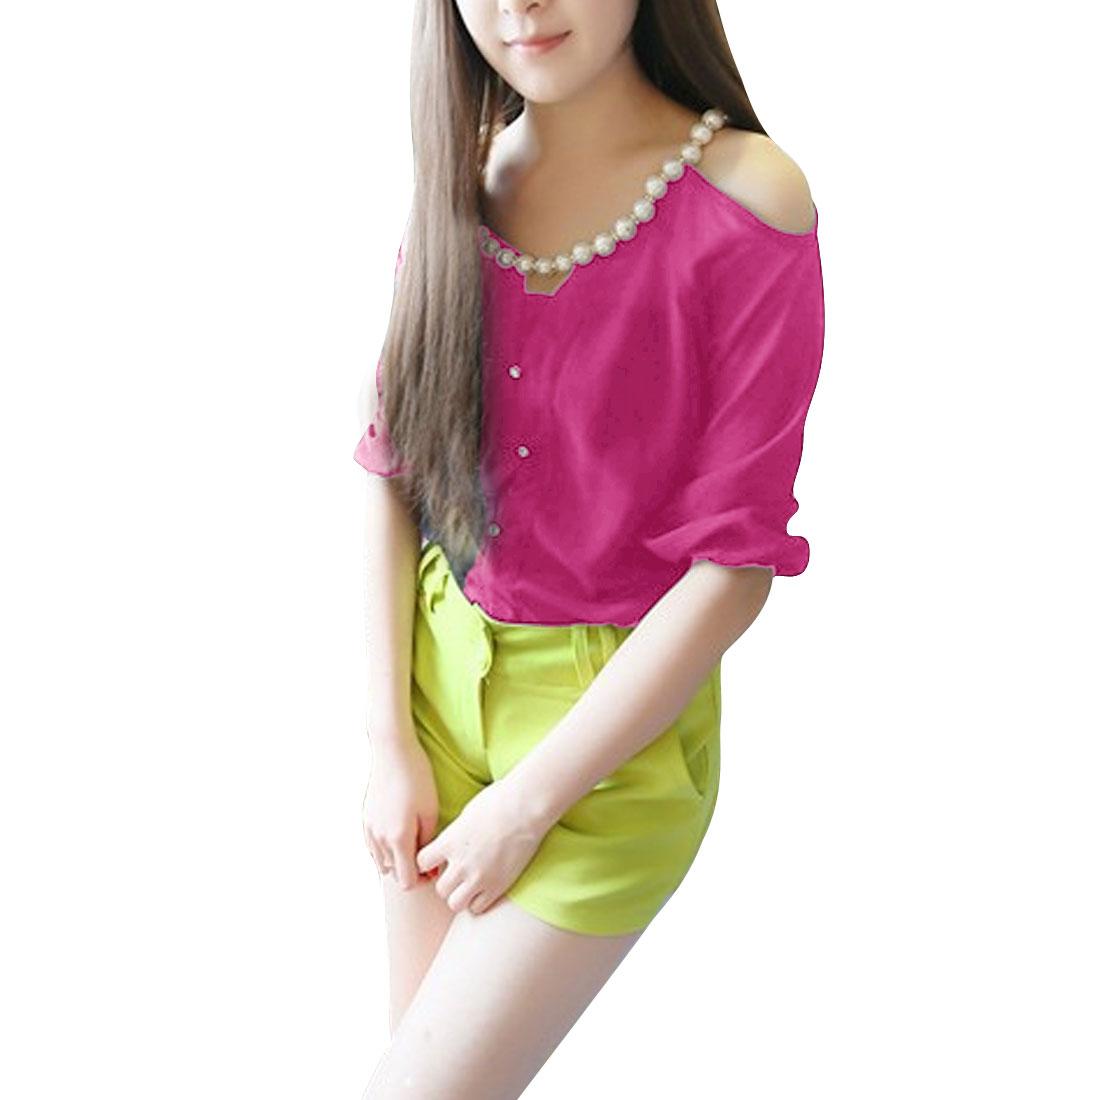 Woman Chic Plastic Pearl Chian Decor Half Sleeve Fuchsia Button Down Blouse